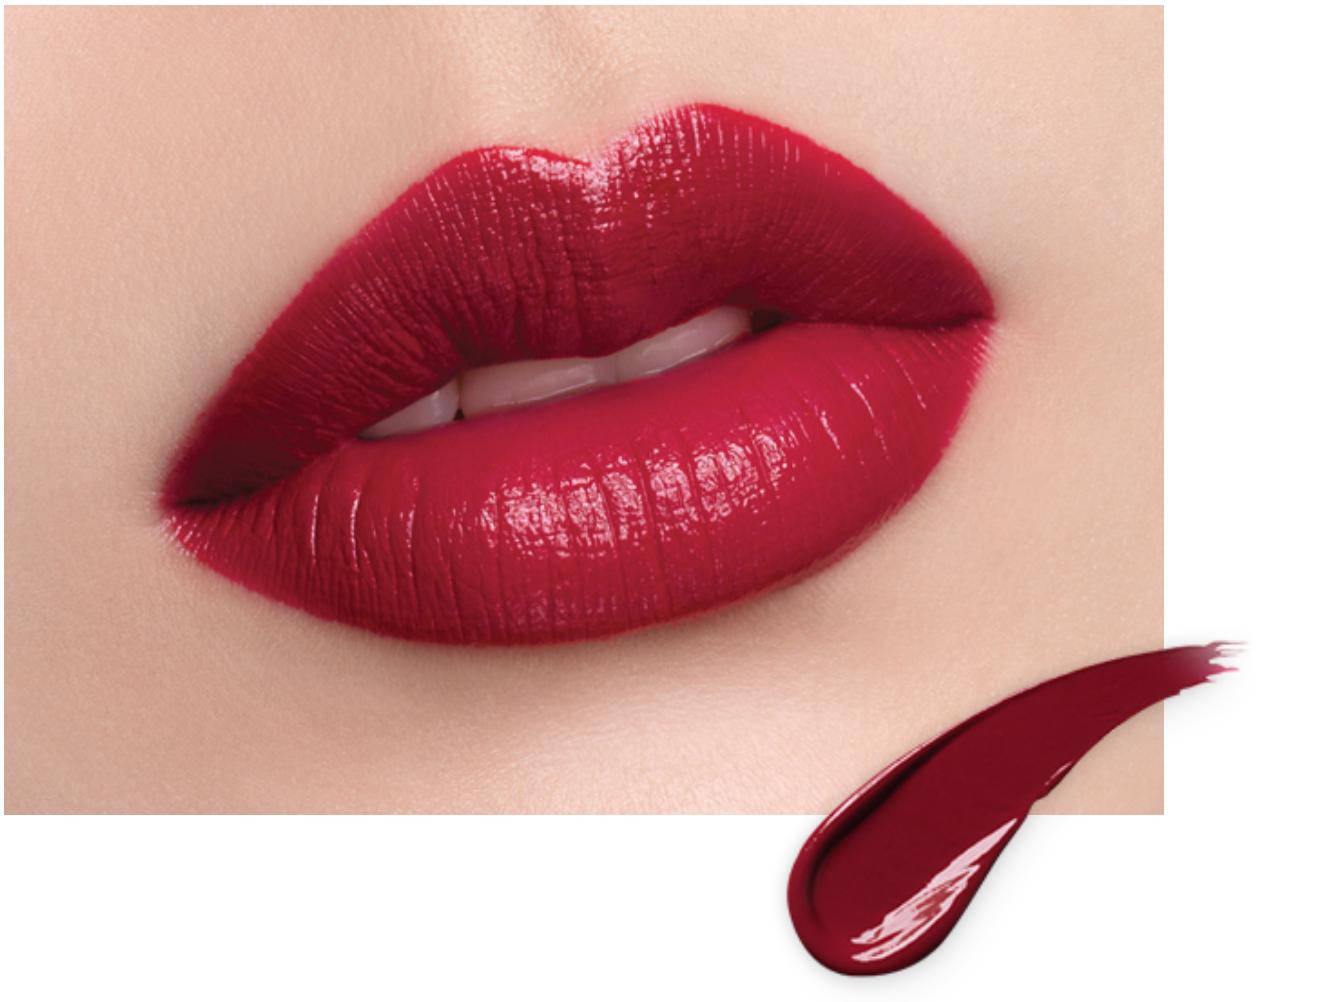 laneige-silk-intense-lipstick-360.png